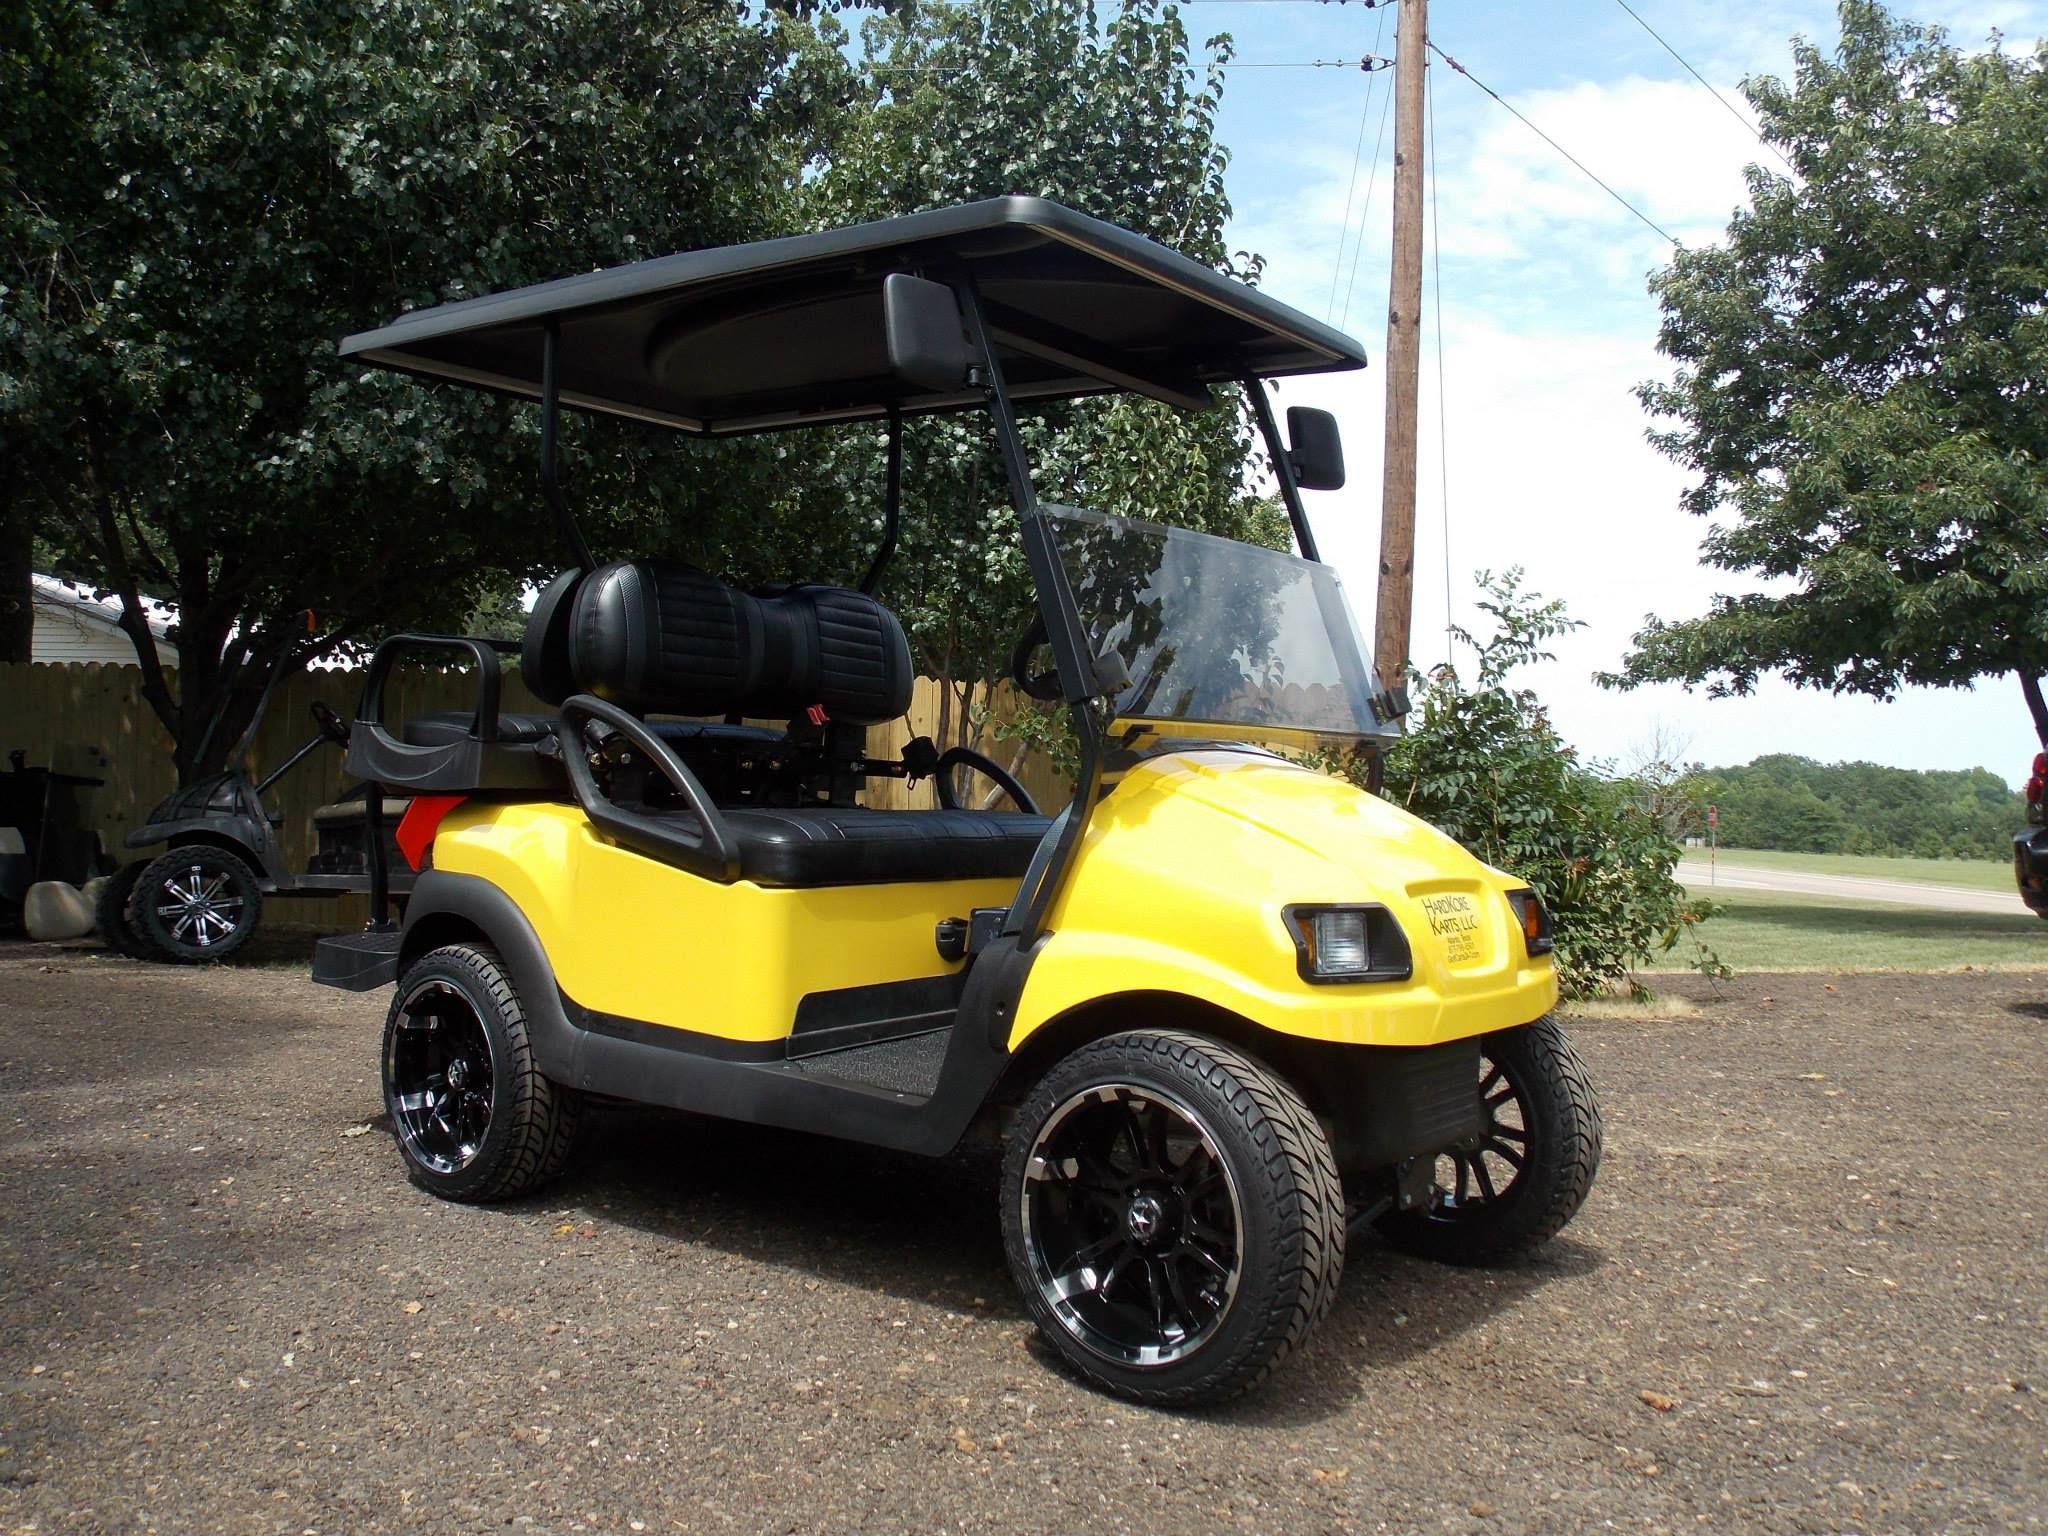 2011 Black N Yellow Phantom Club Car Precedent Electric 48v Golf Cart Golf Carts Lifted Golf Carts Golf